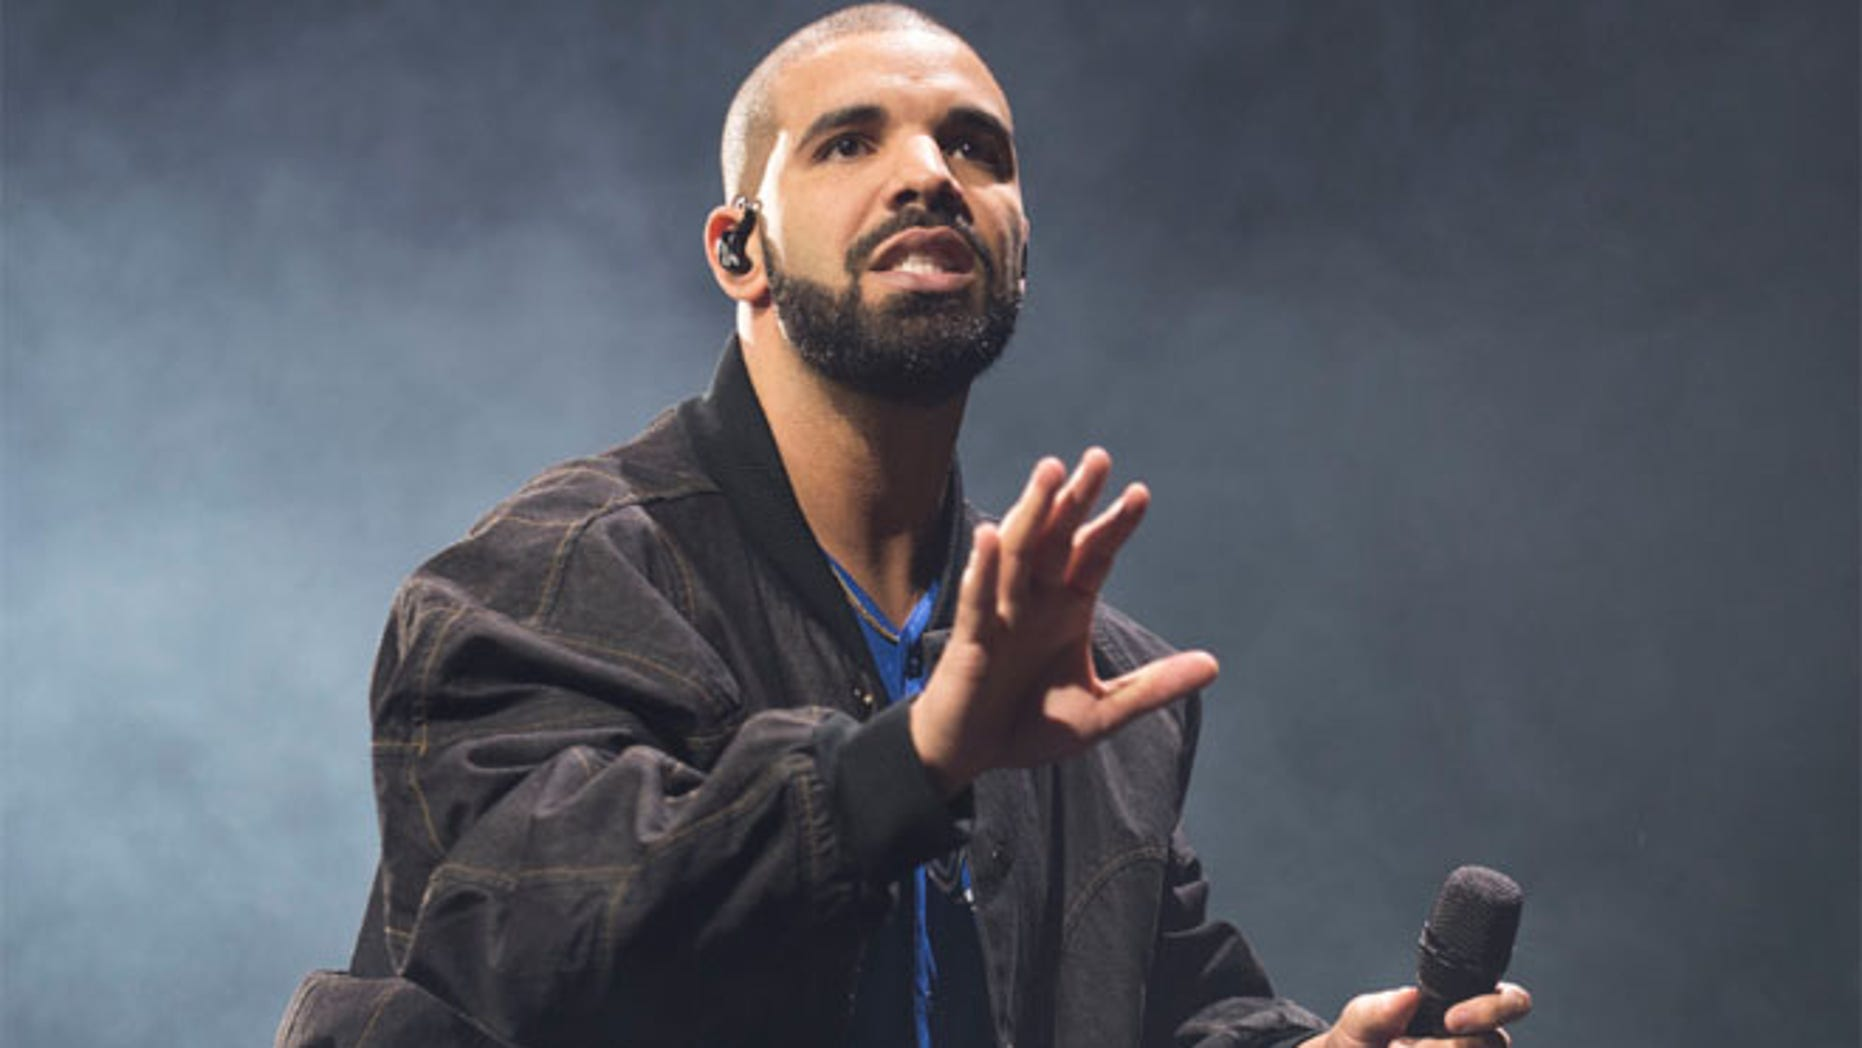 FILE 2016: Drake performs onstage in Toronto.